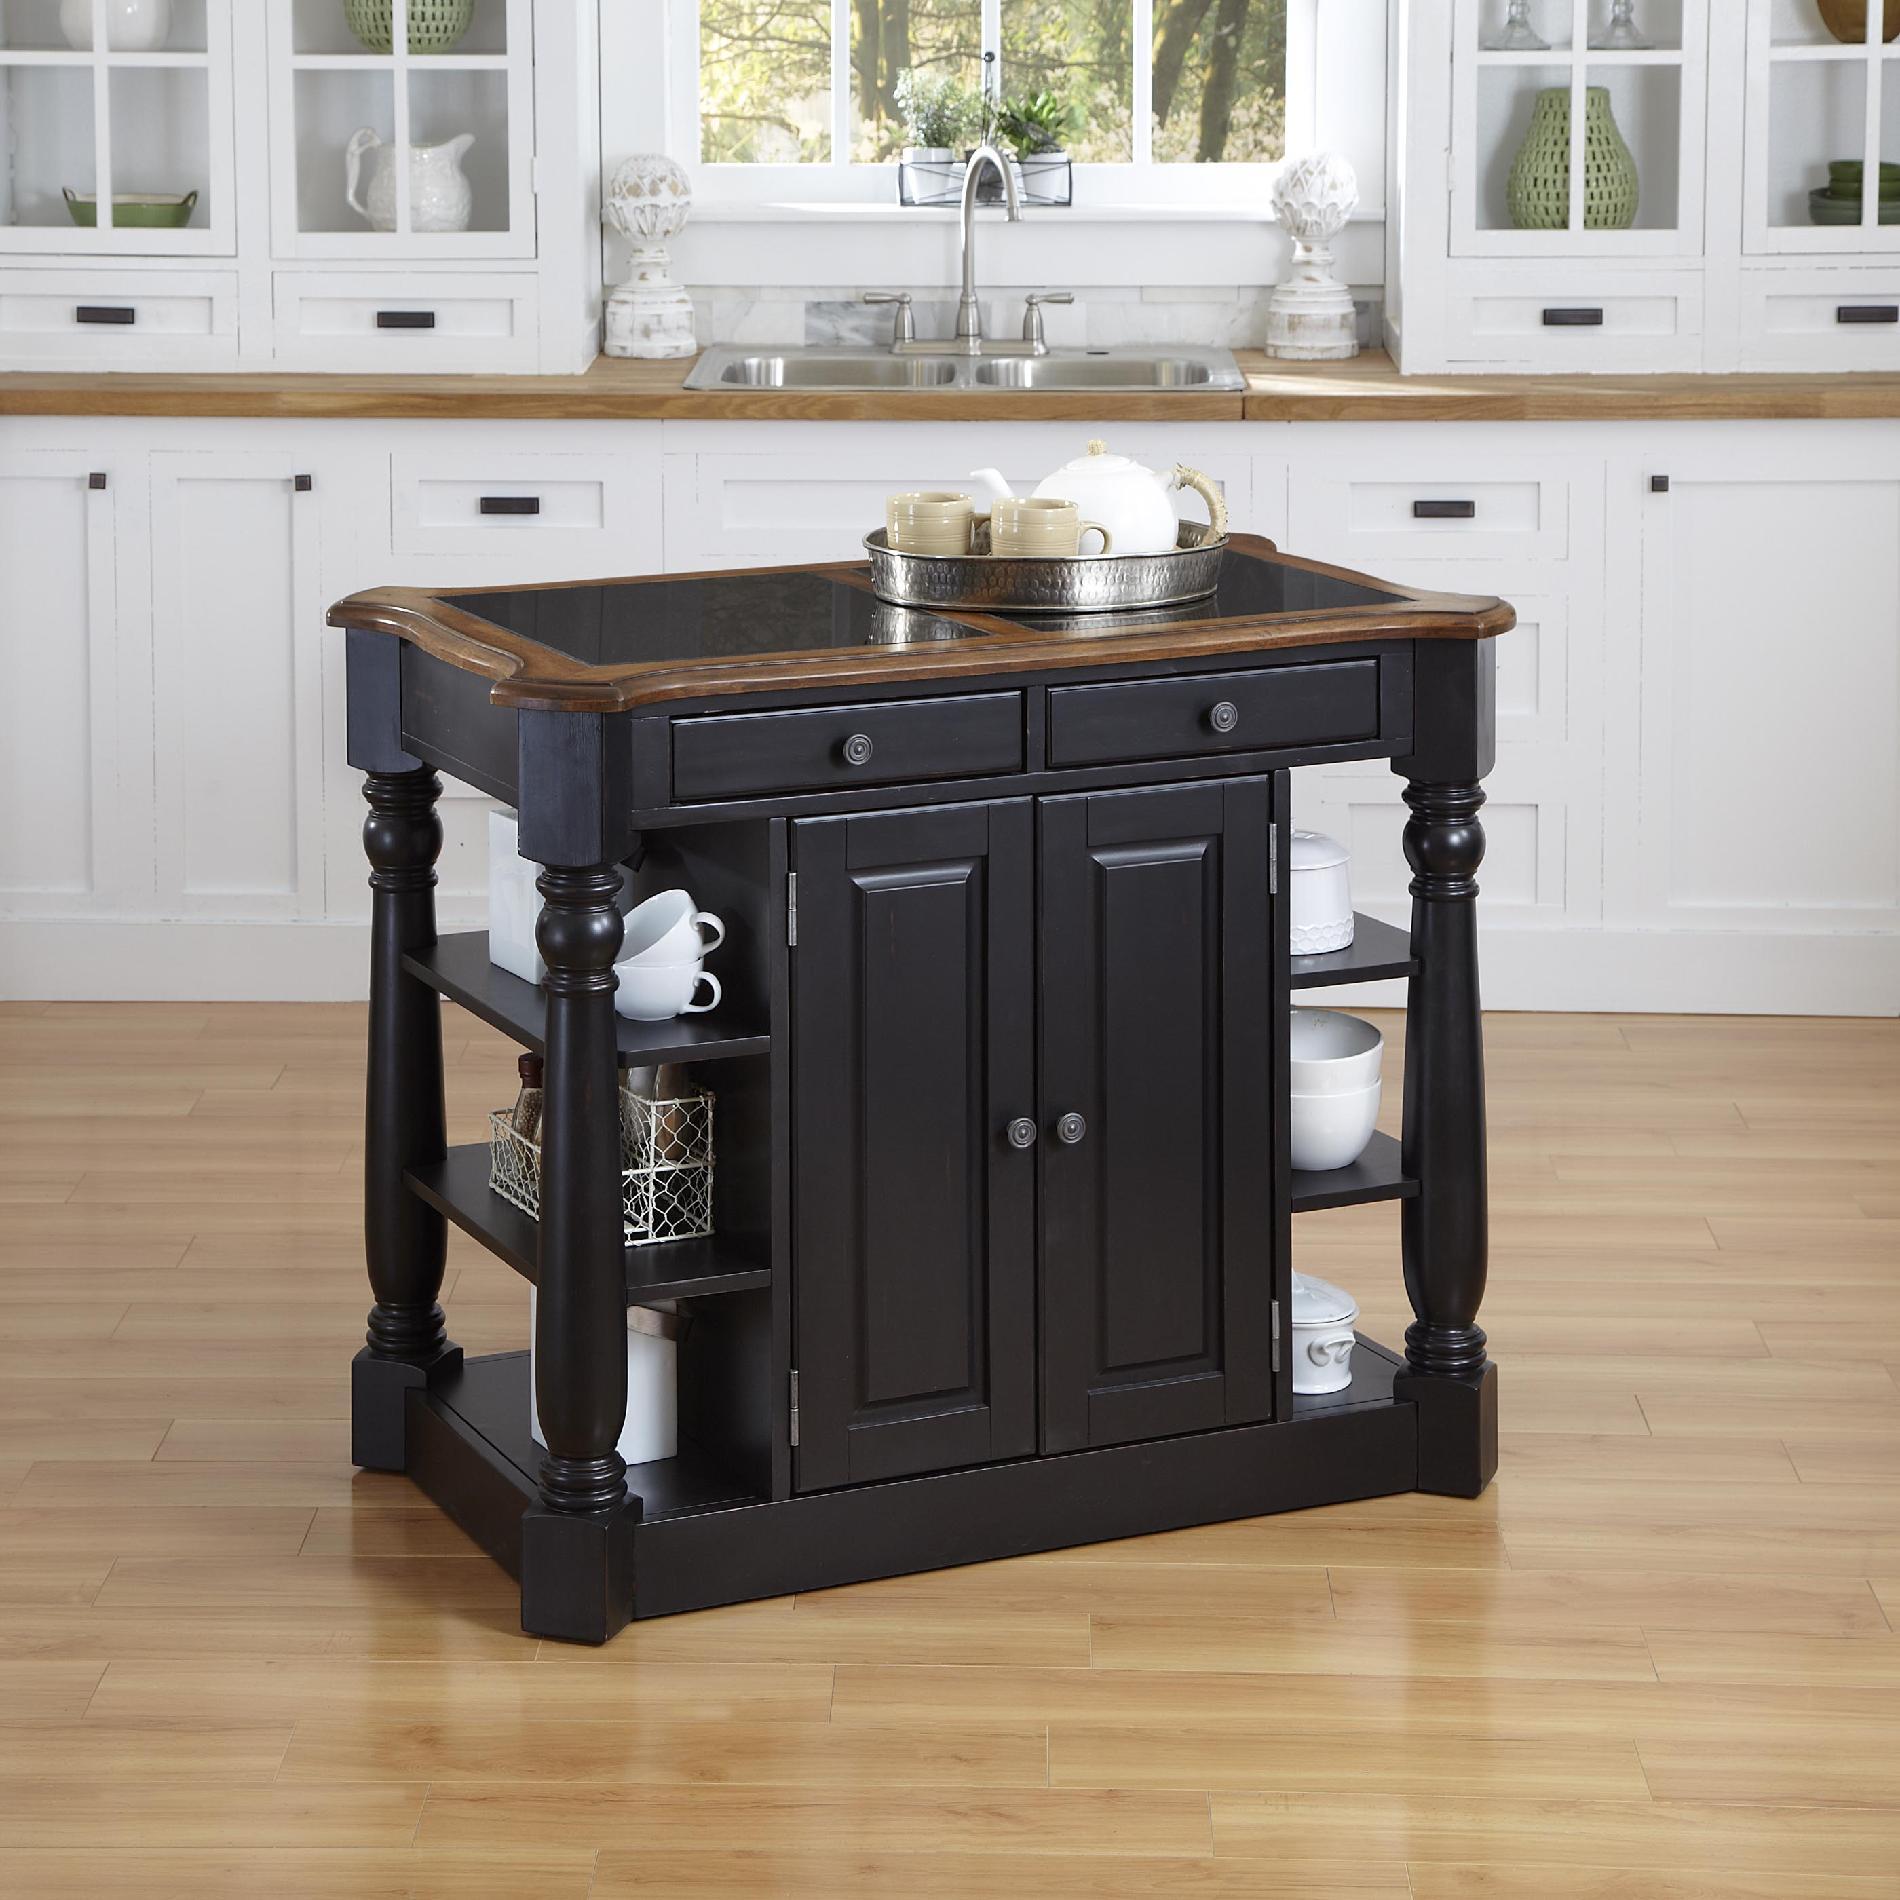 Marvelous Home Styles Americana Granite Kitchen Island   Sears